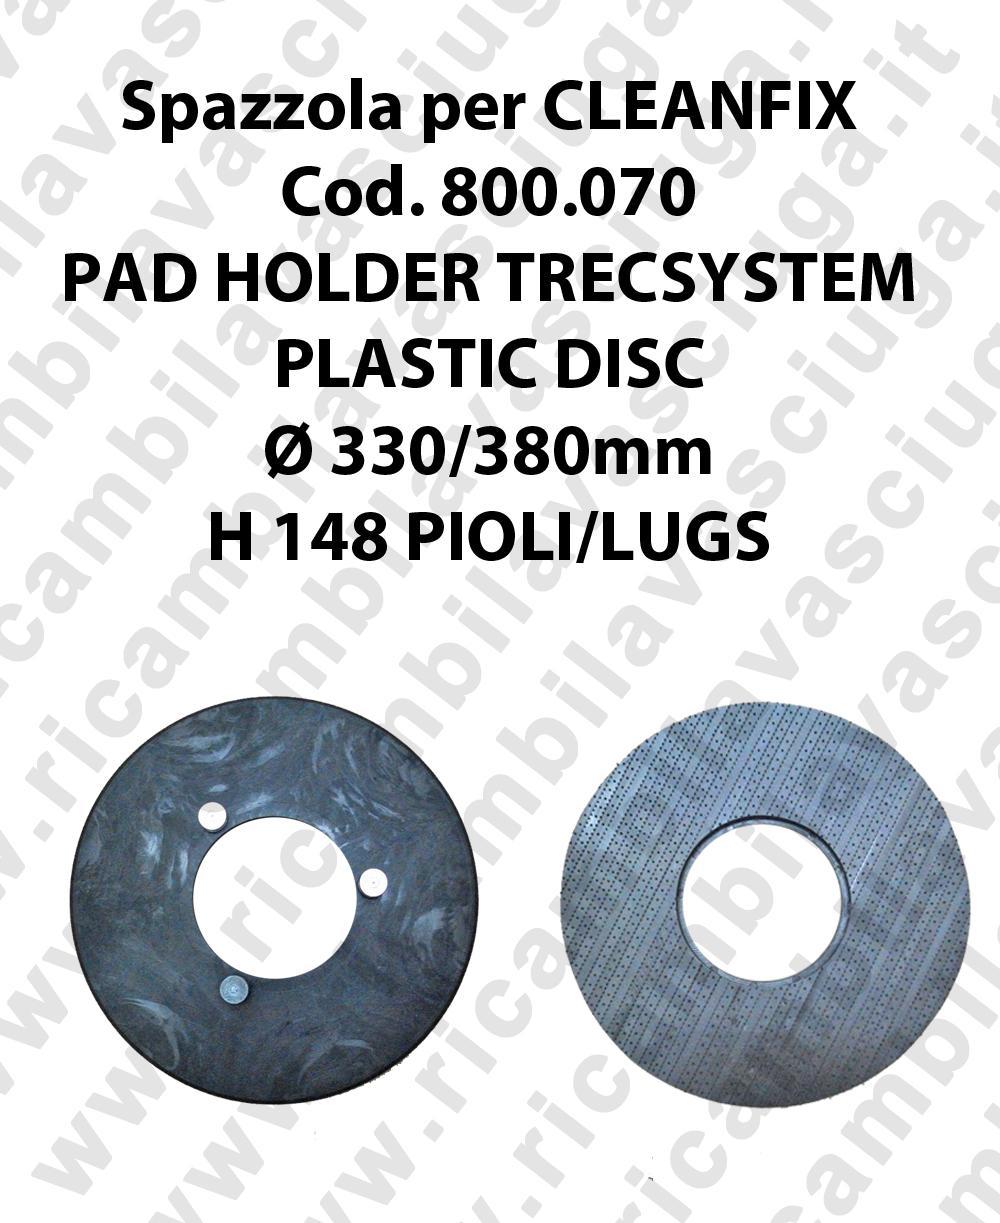 PAD HOLDER TRECSYSTEM  per lavapavimenti CLEANFIX codice 800.070